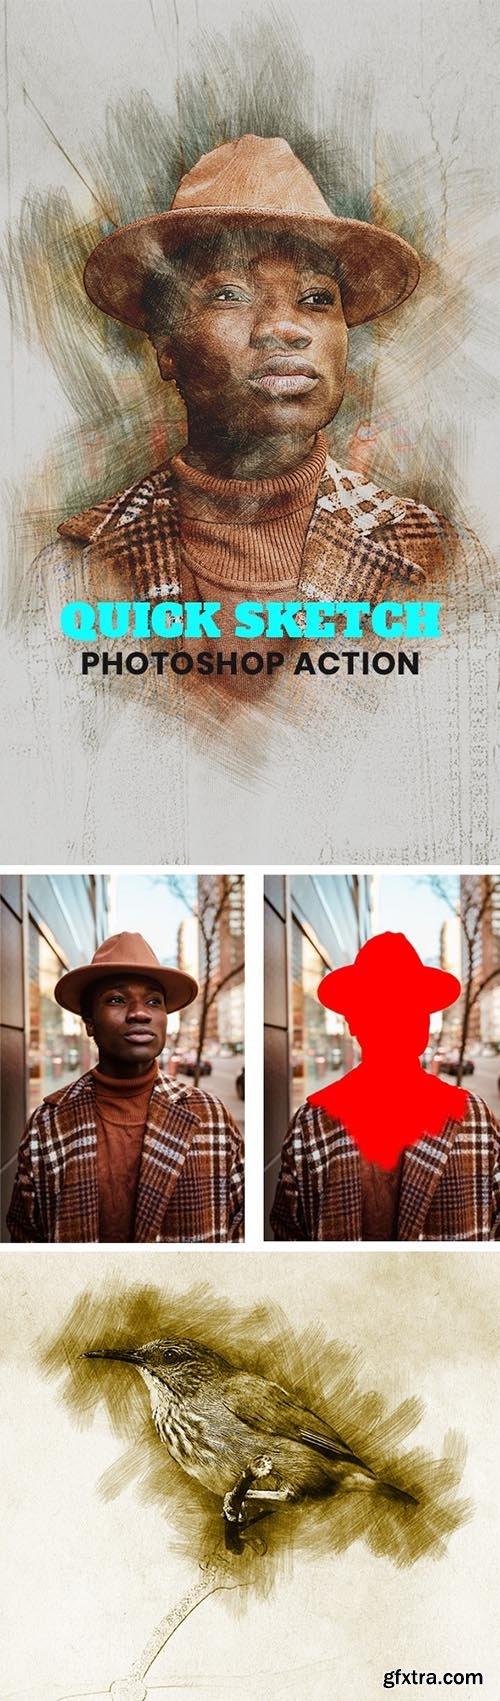 GraphicRiver - Quick Sketch Photoshop Action 31762904